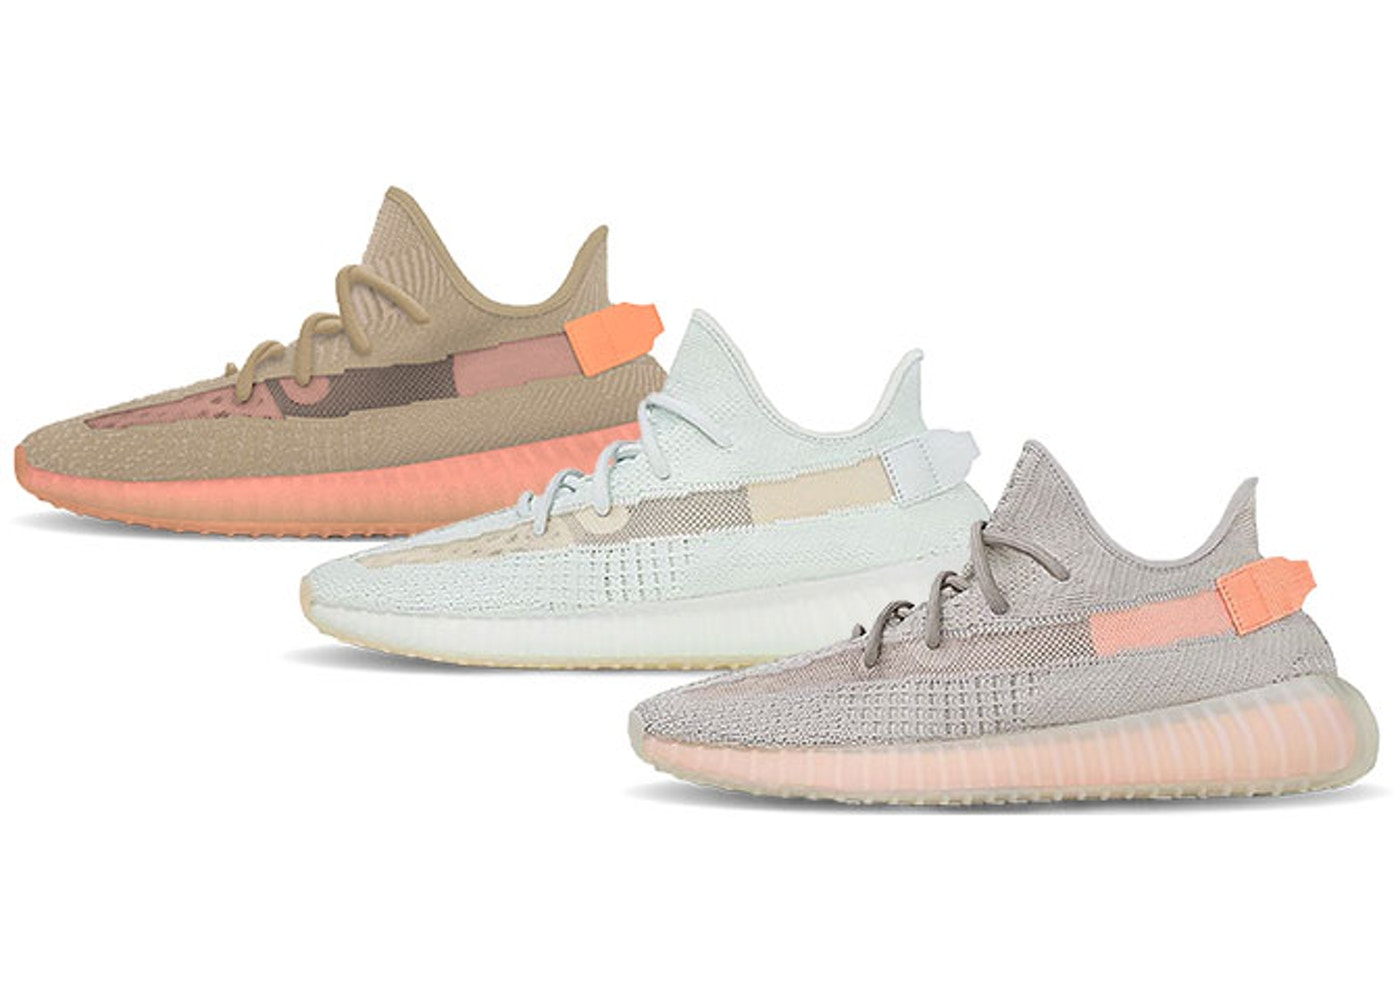 9e492590 Yeezy 350 Bundle ReStockX - Sneakers